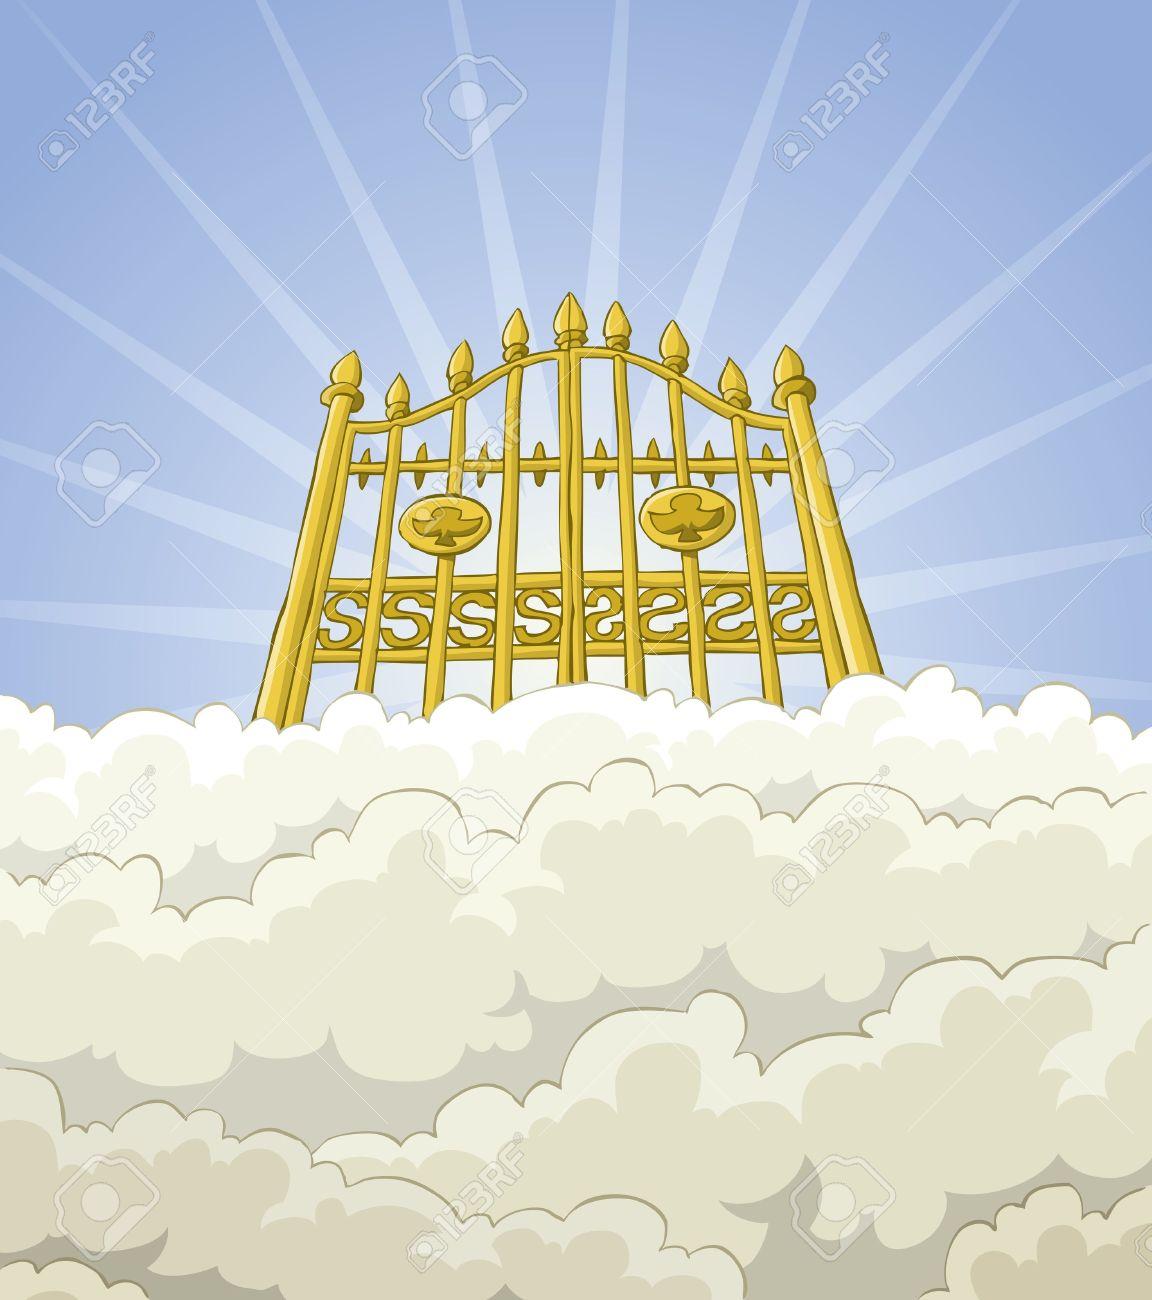 Heaven clipart golden gates. Station